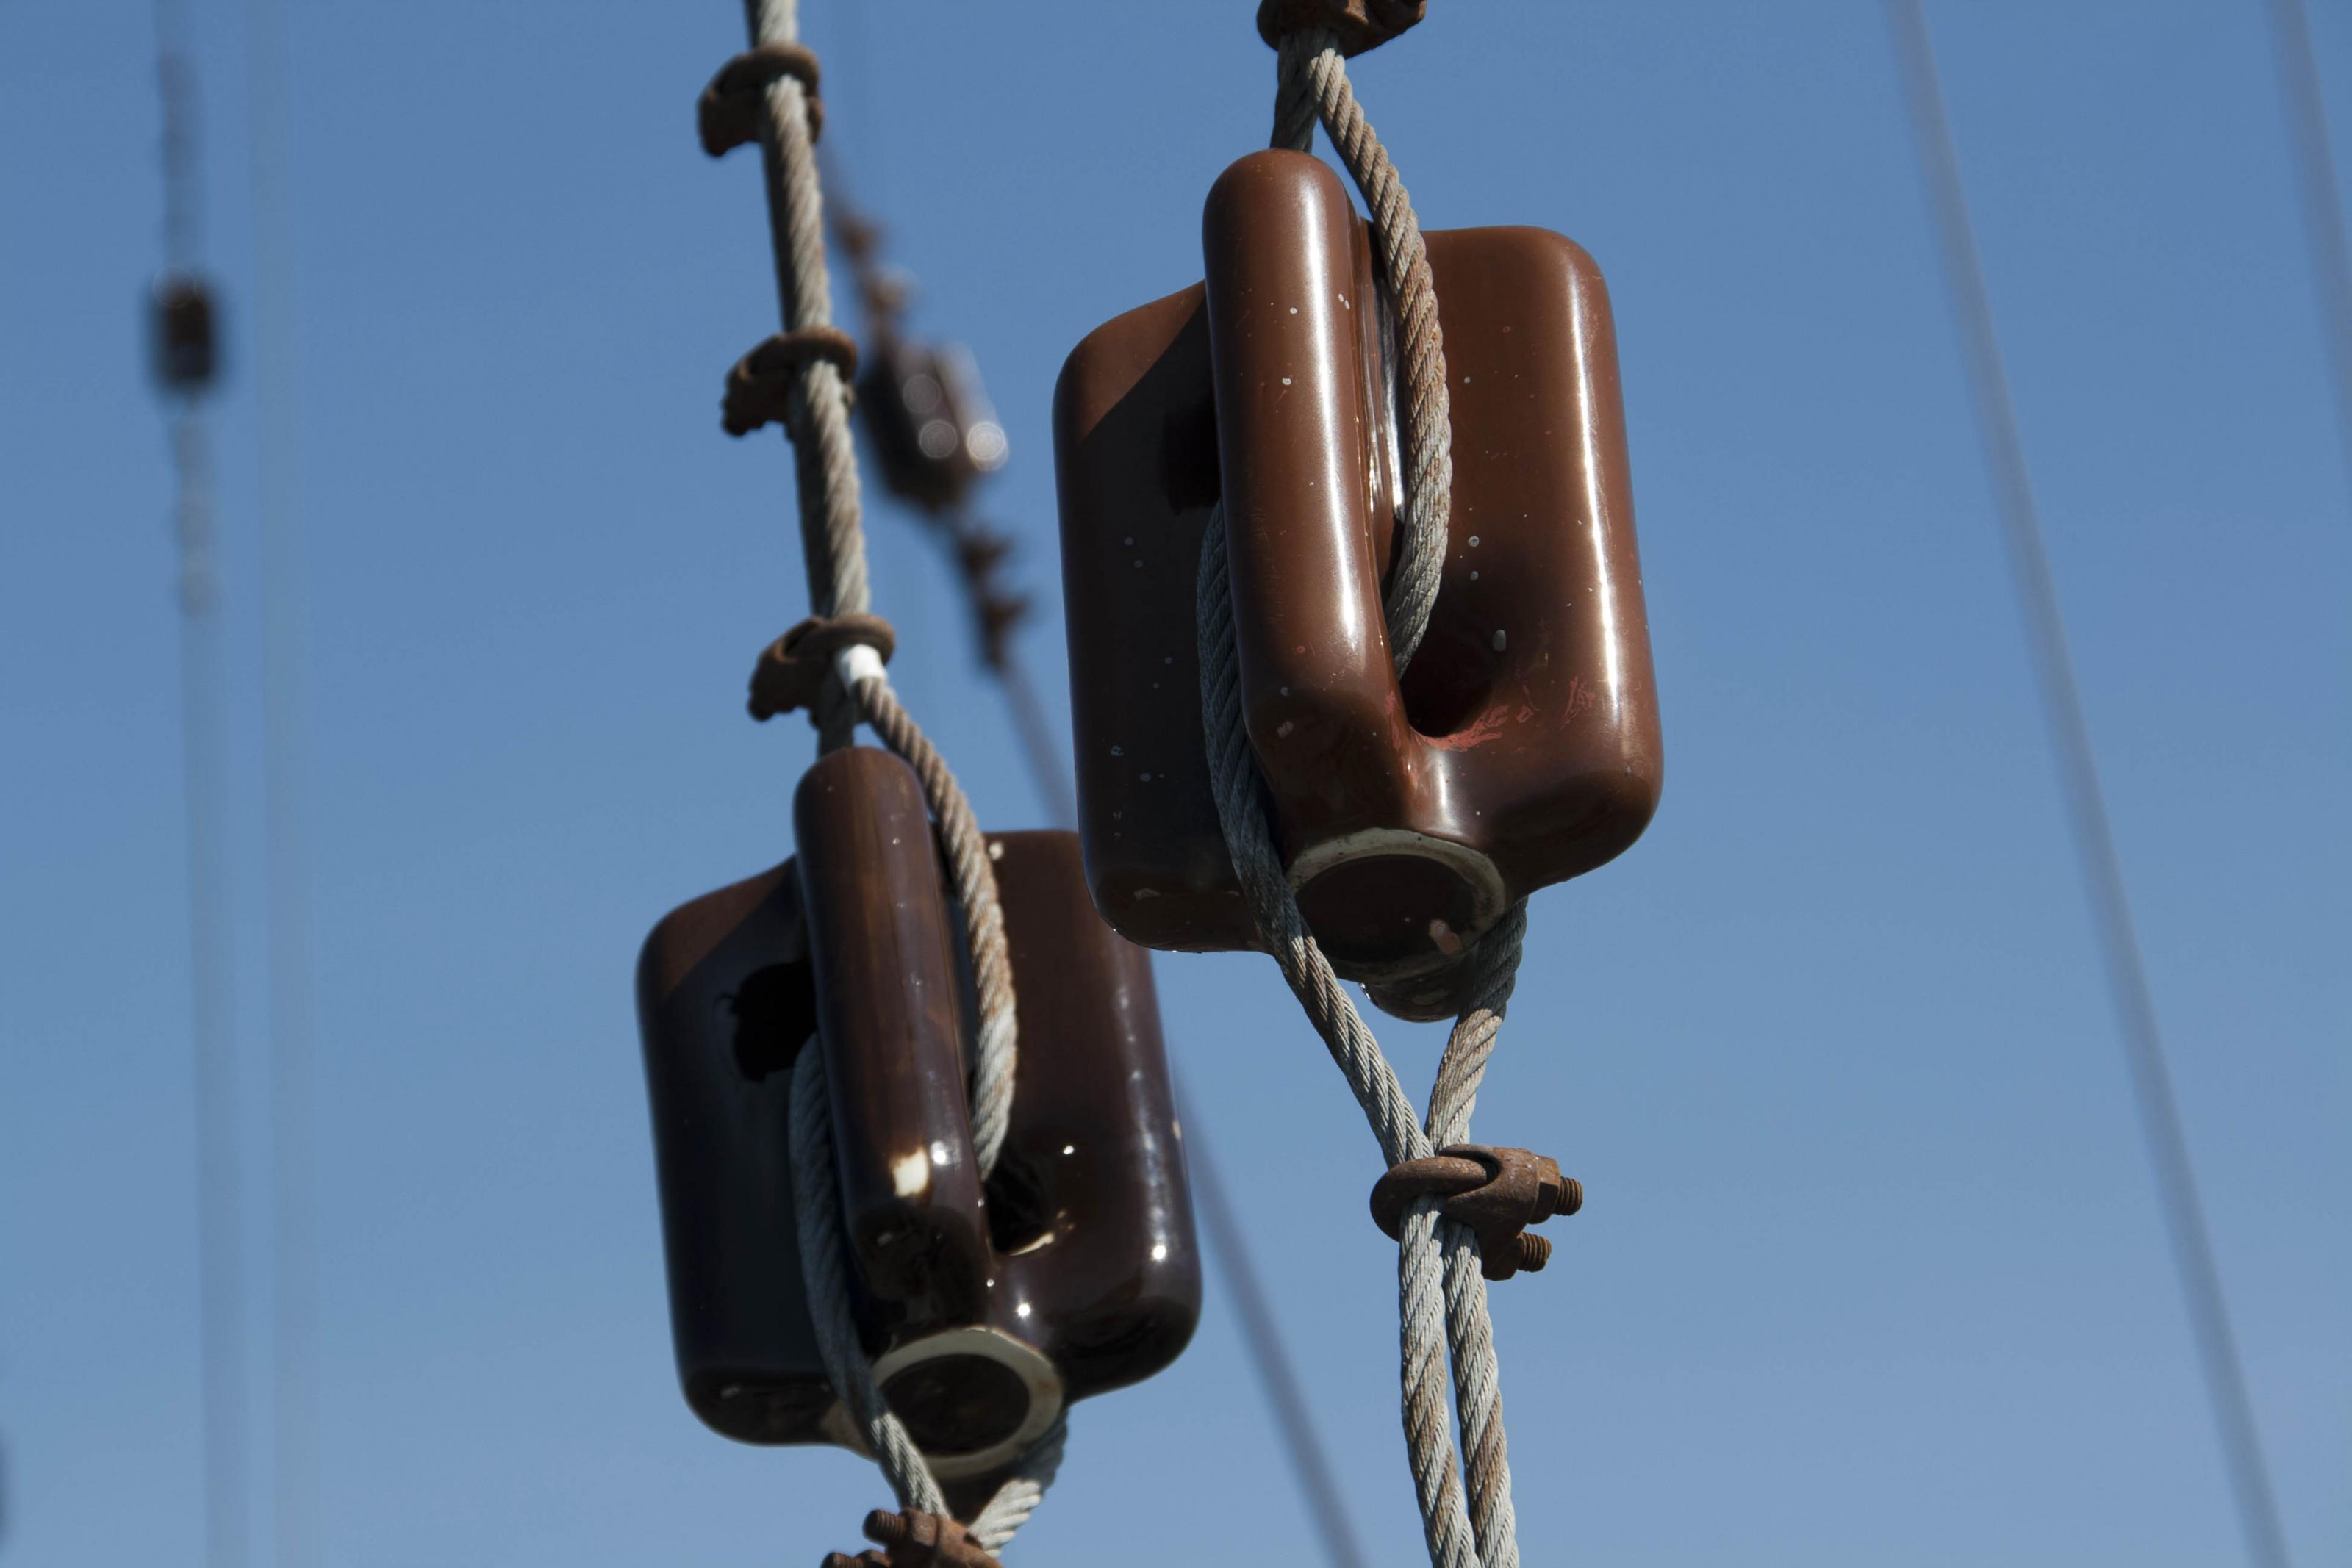 2011-06-02-RadioWaddenzee-155.jpg